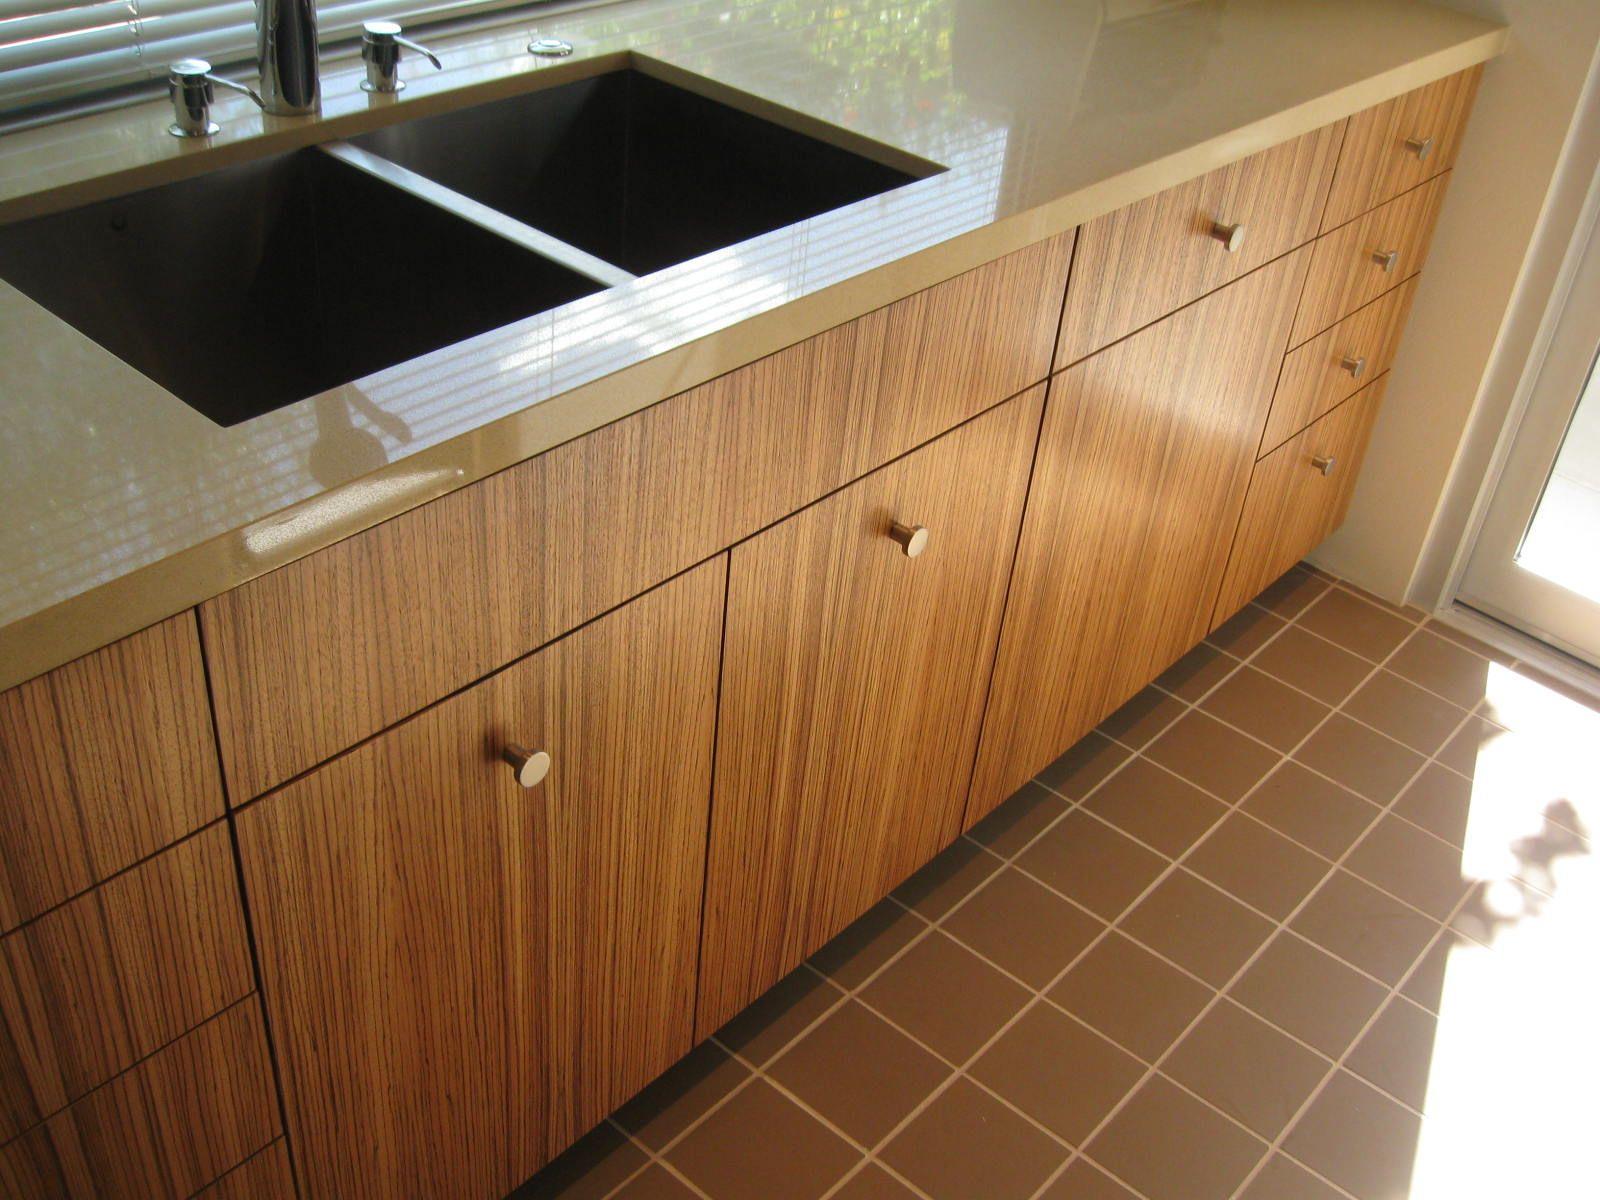 Semihandmade Zebrawood Ikea Kitchen In Palm Springs Ca Ikea Cabinets Custom Cabinet Doors Zebra Wood